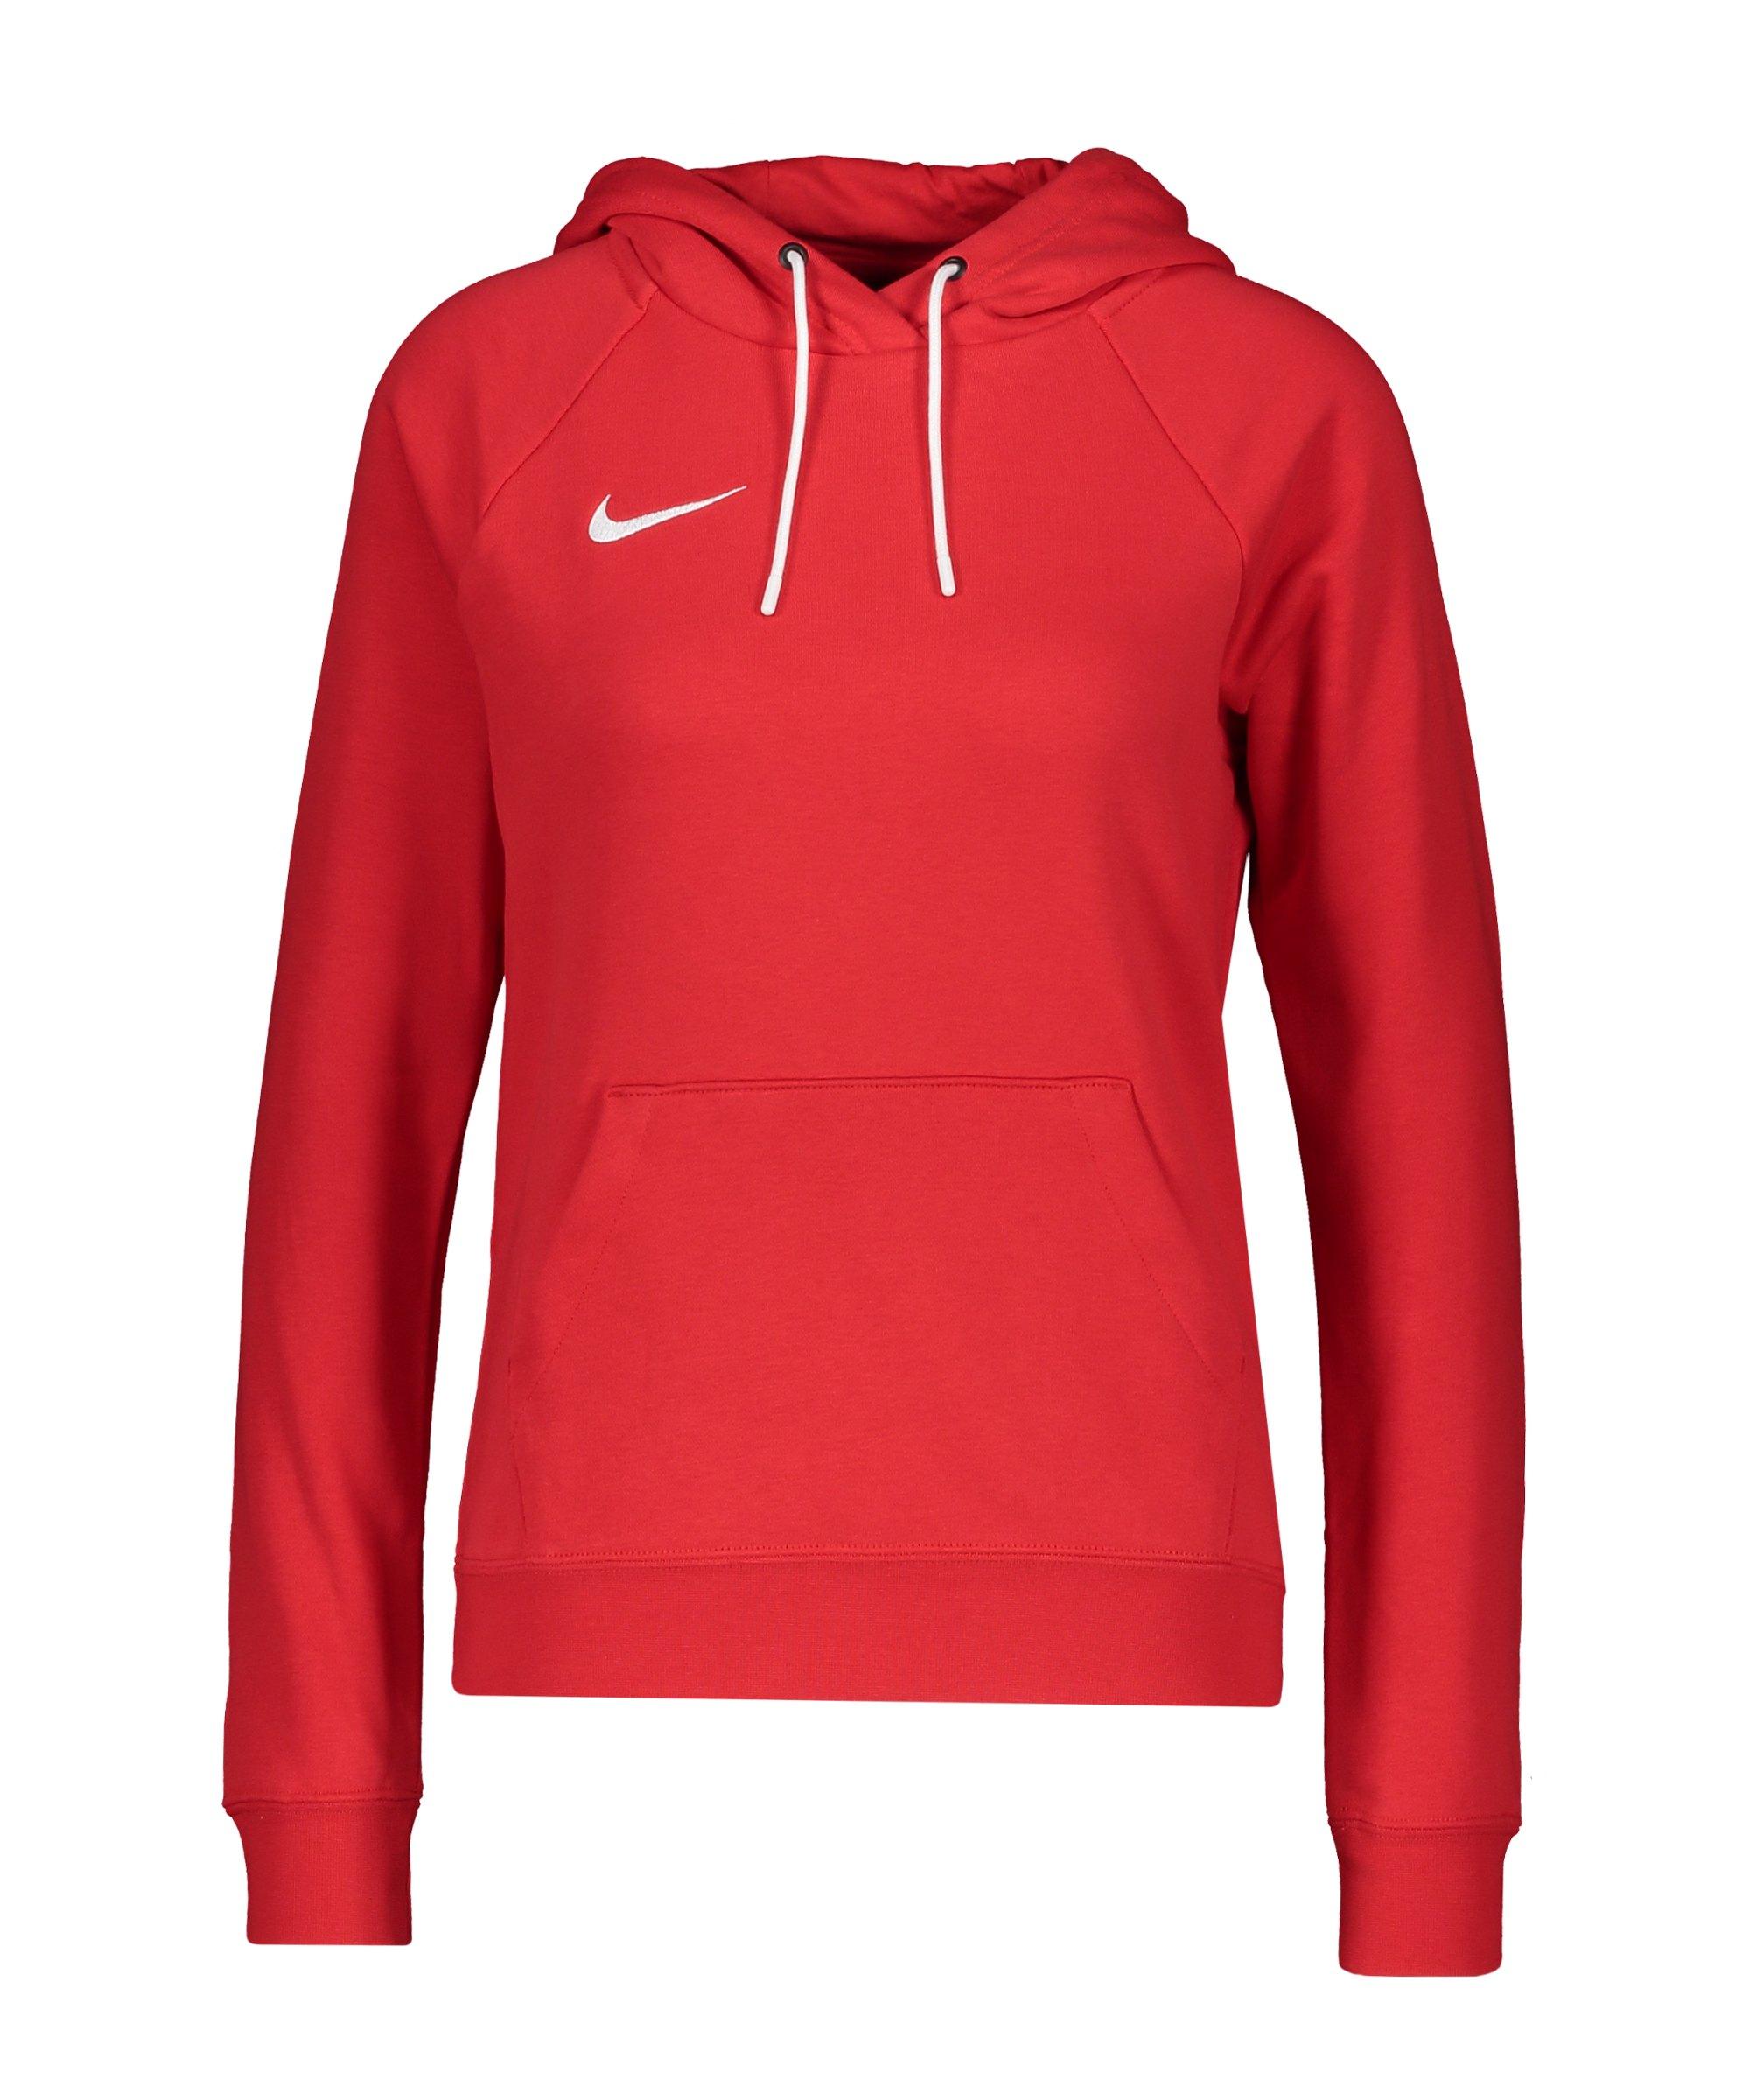 Nike Park 20 Fleece Hoody Damen Rot Weiss F657 - rot